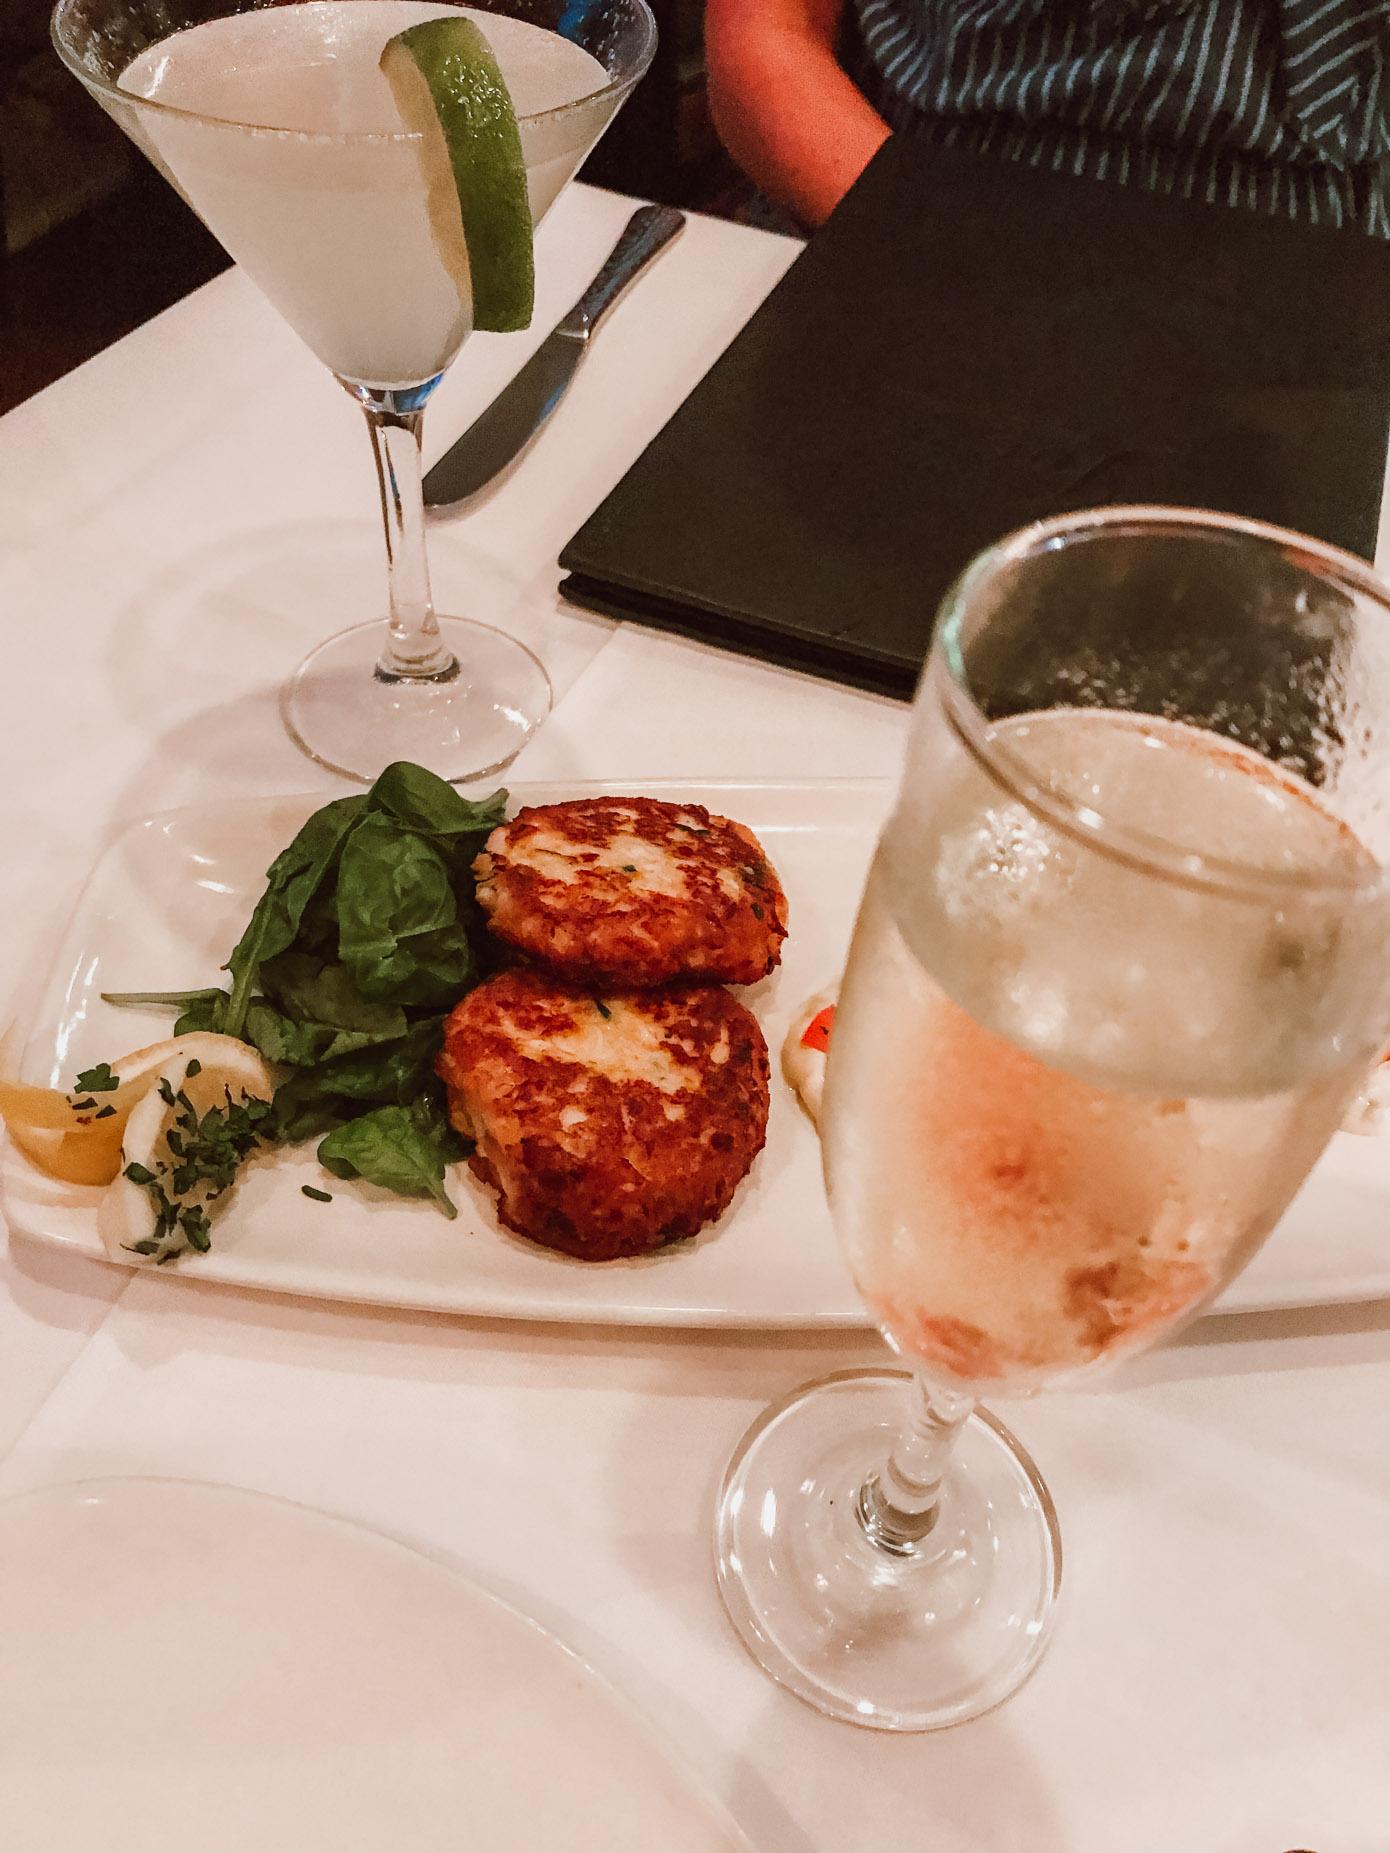 Where to eat in Amelia Island | Joe's 2nd Street Bistro | Louella Reese